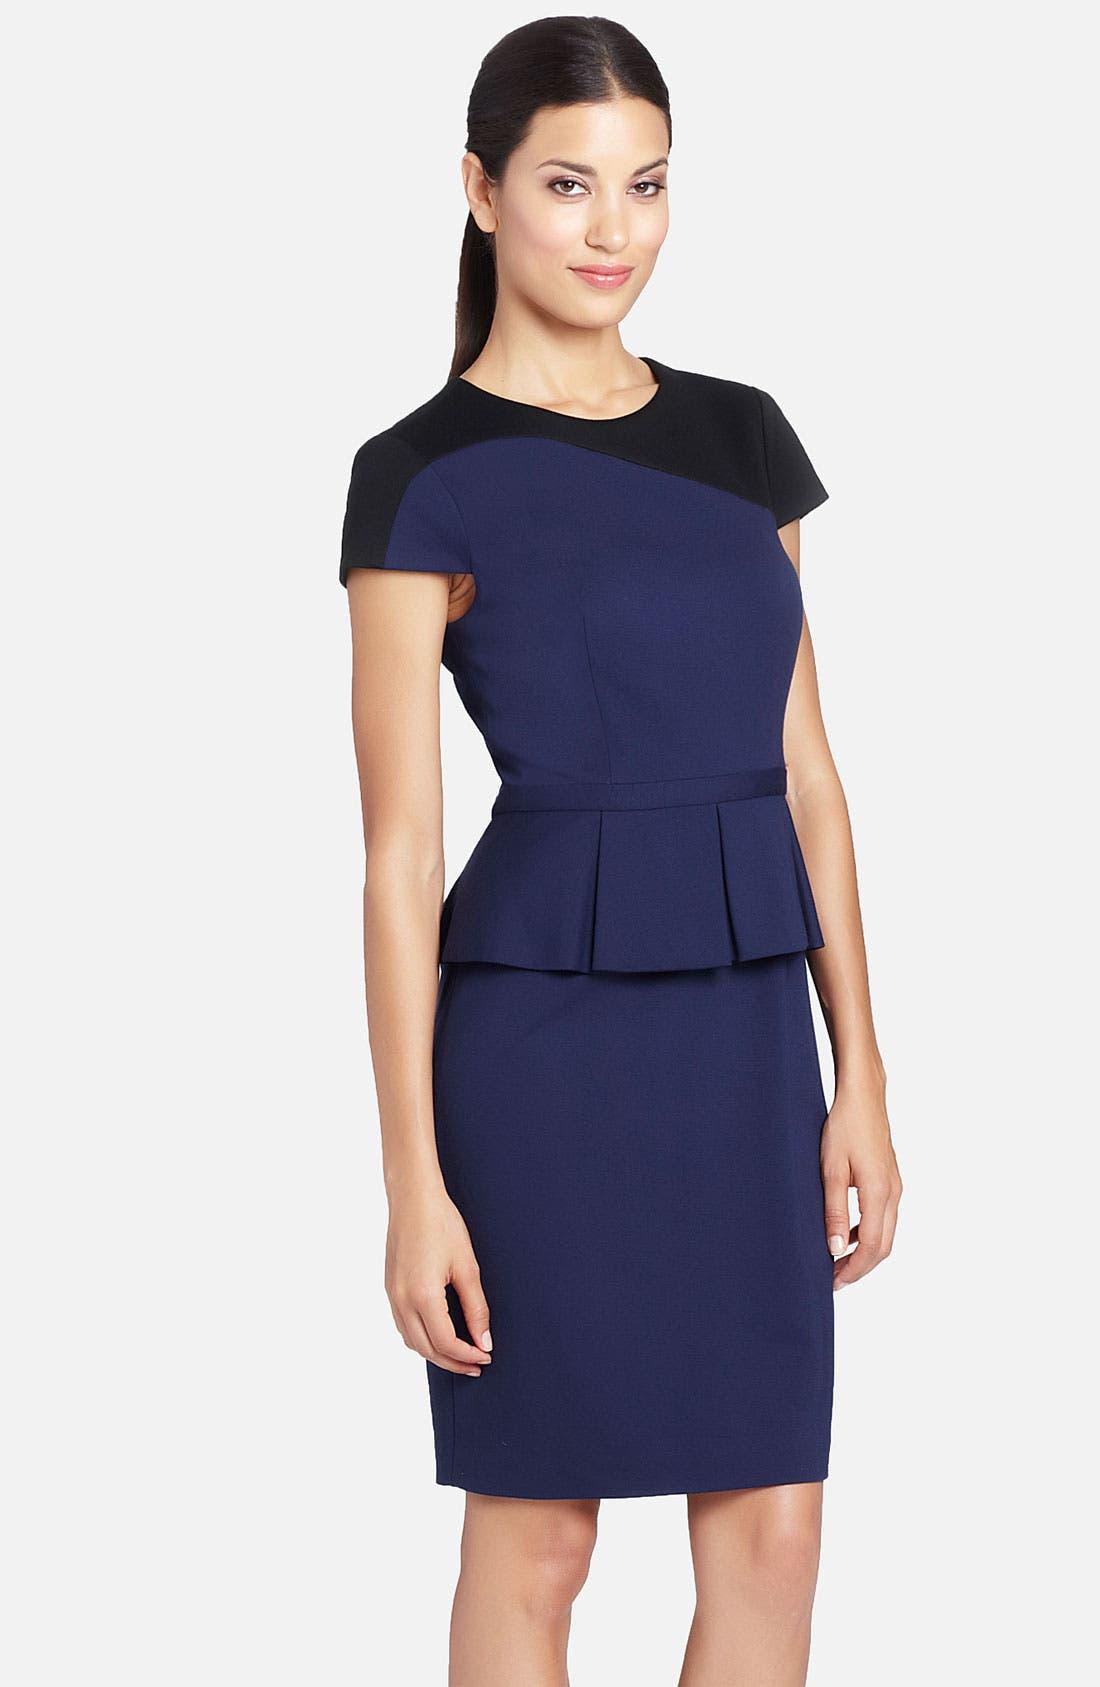 Alternate Image 1 Selected - Cynthia Steffe Colorblock Peplum Dress